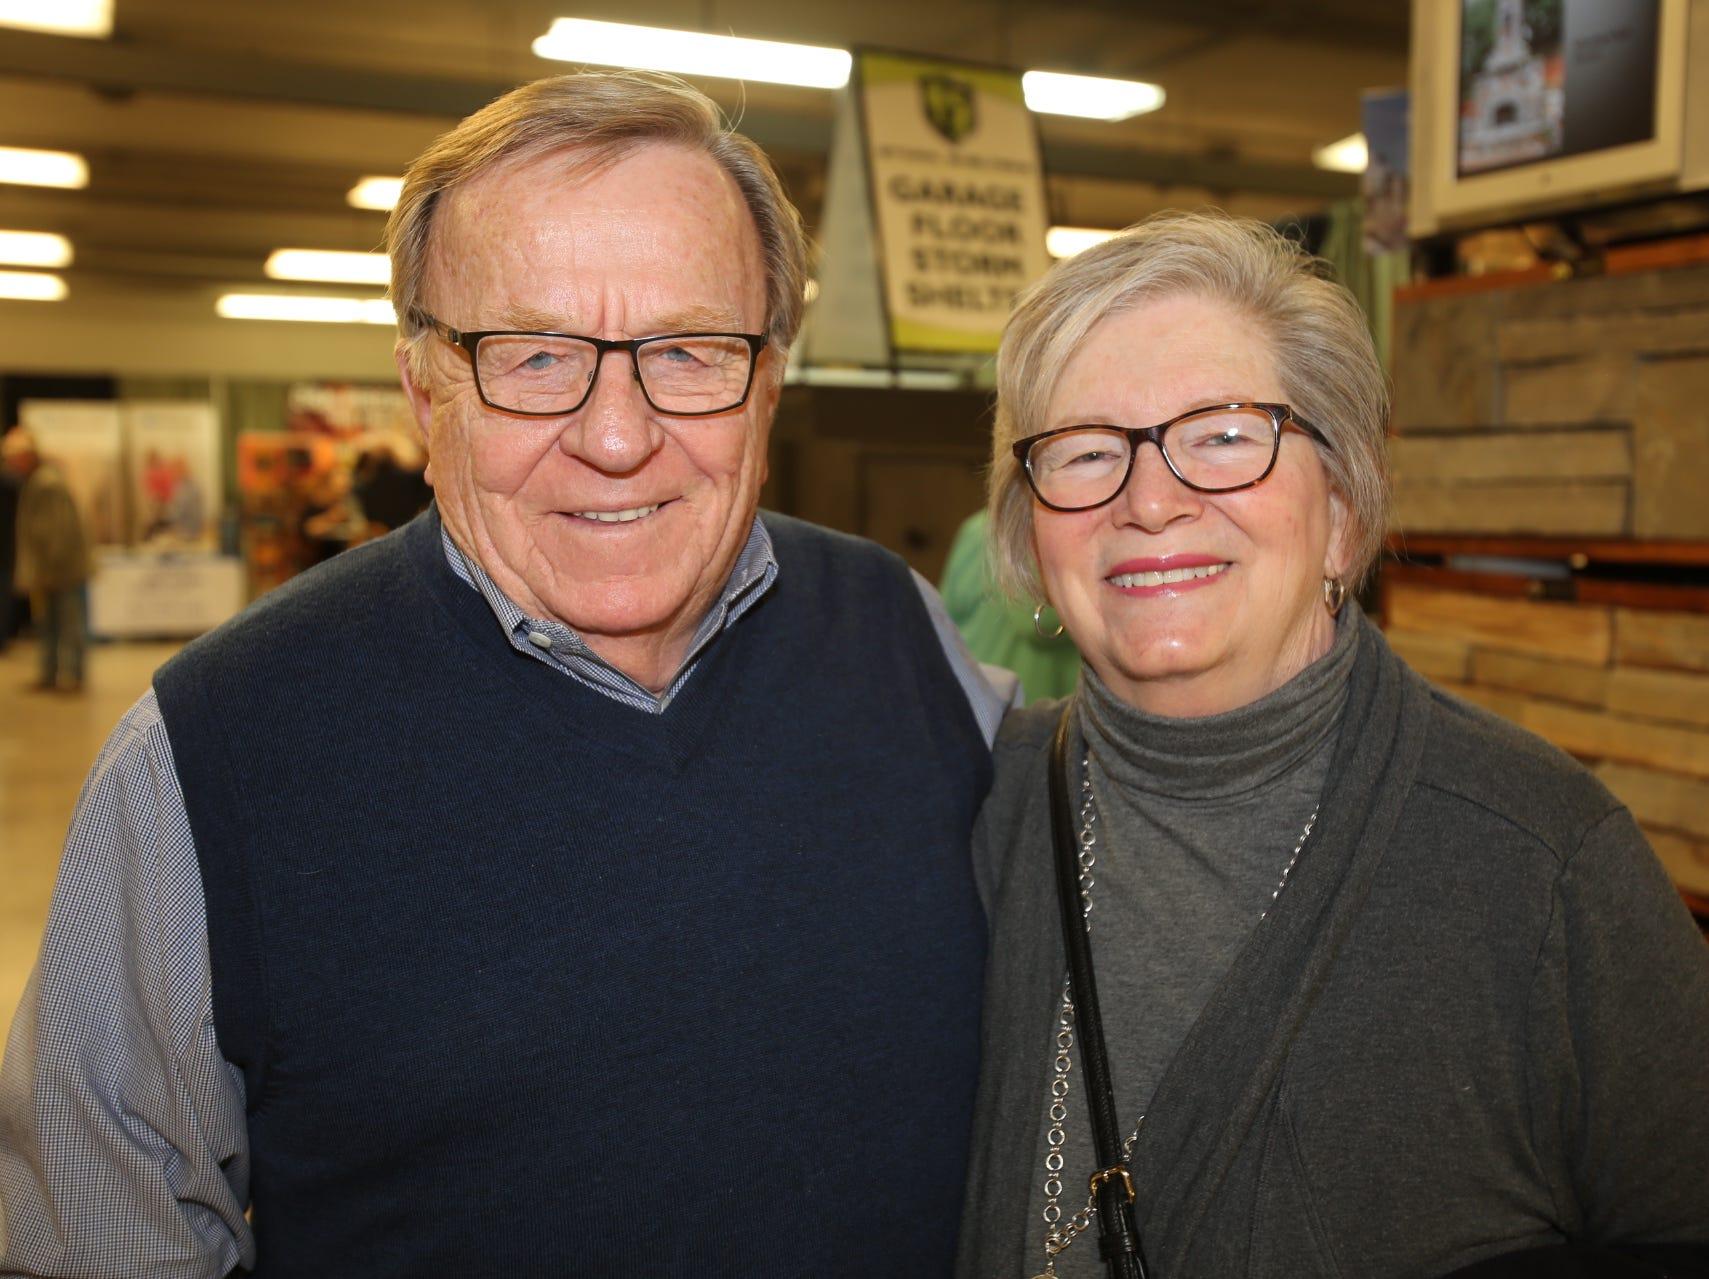 Carl and Lisa Westlund